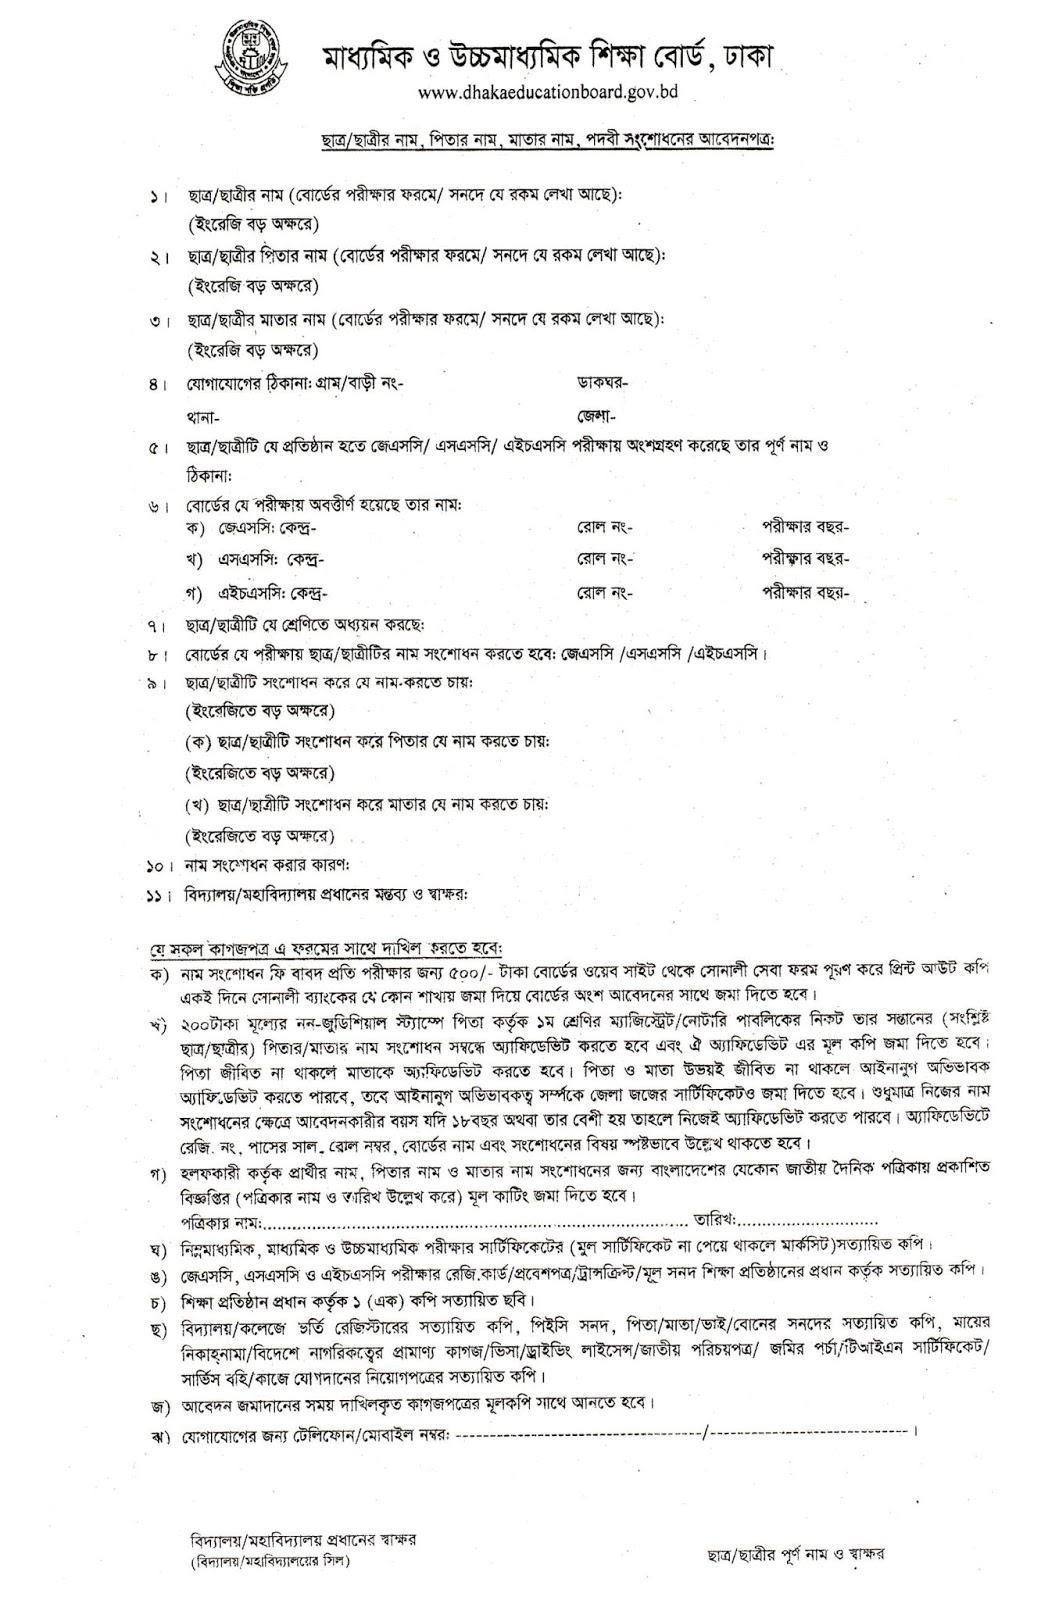 Dhaka Education Board Name Correction Form